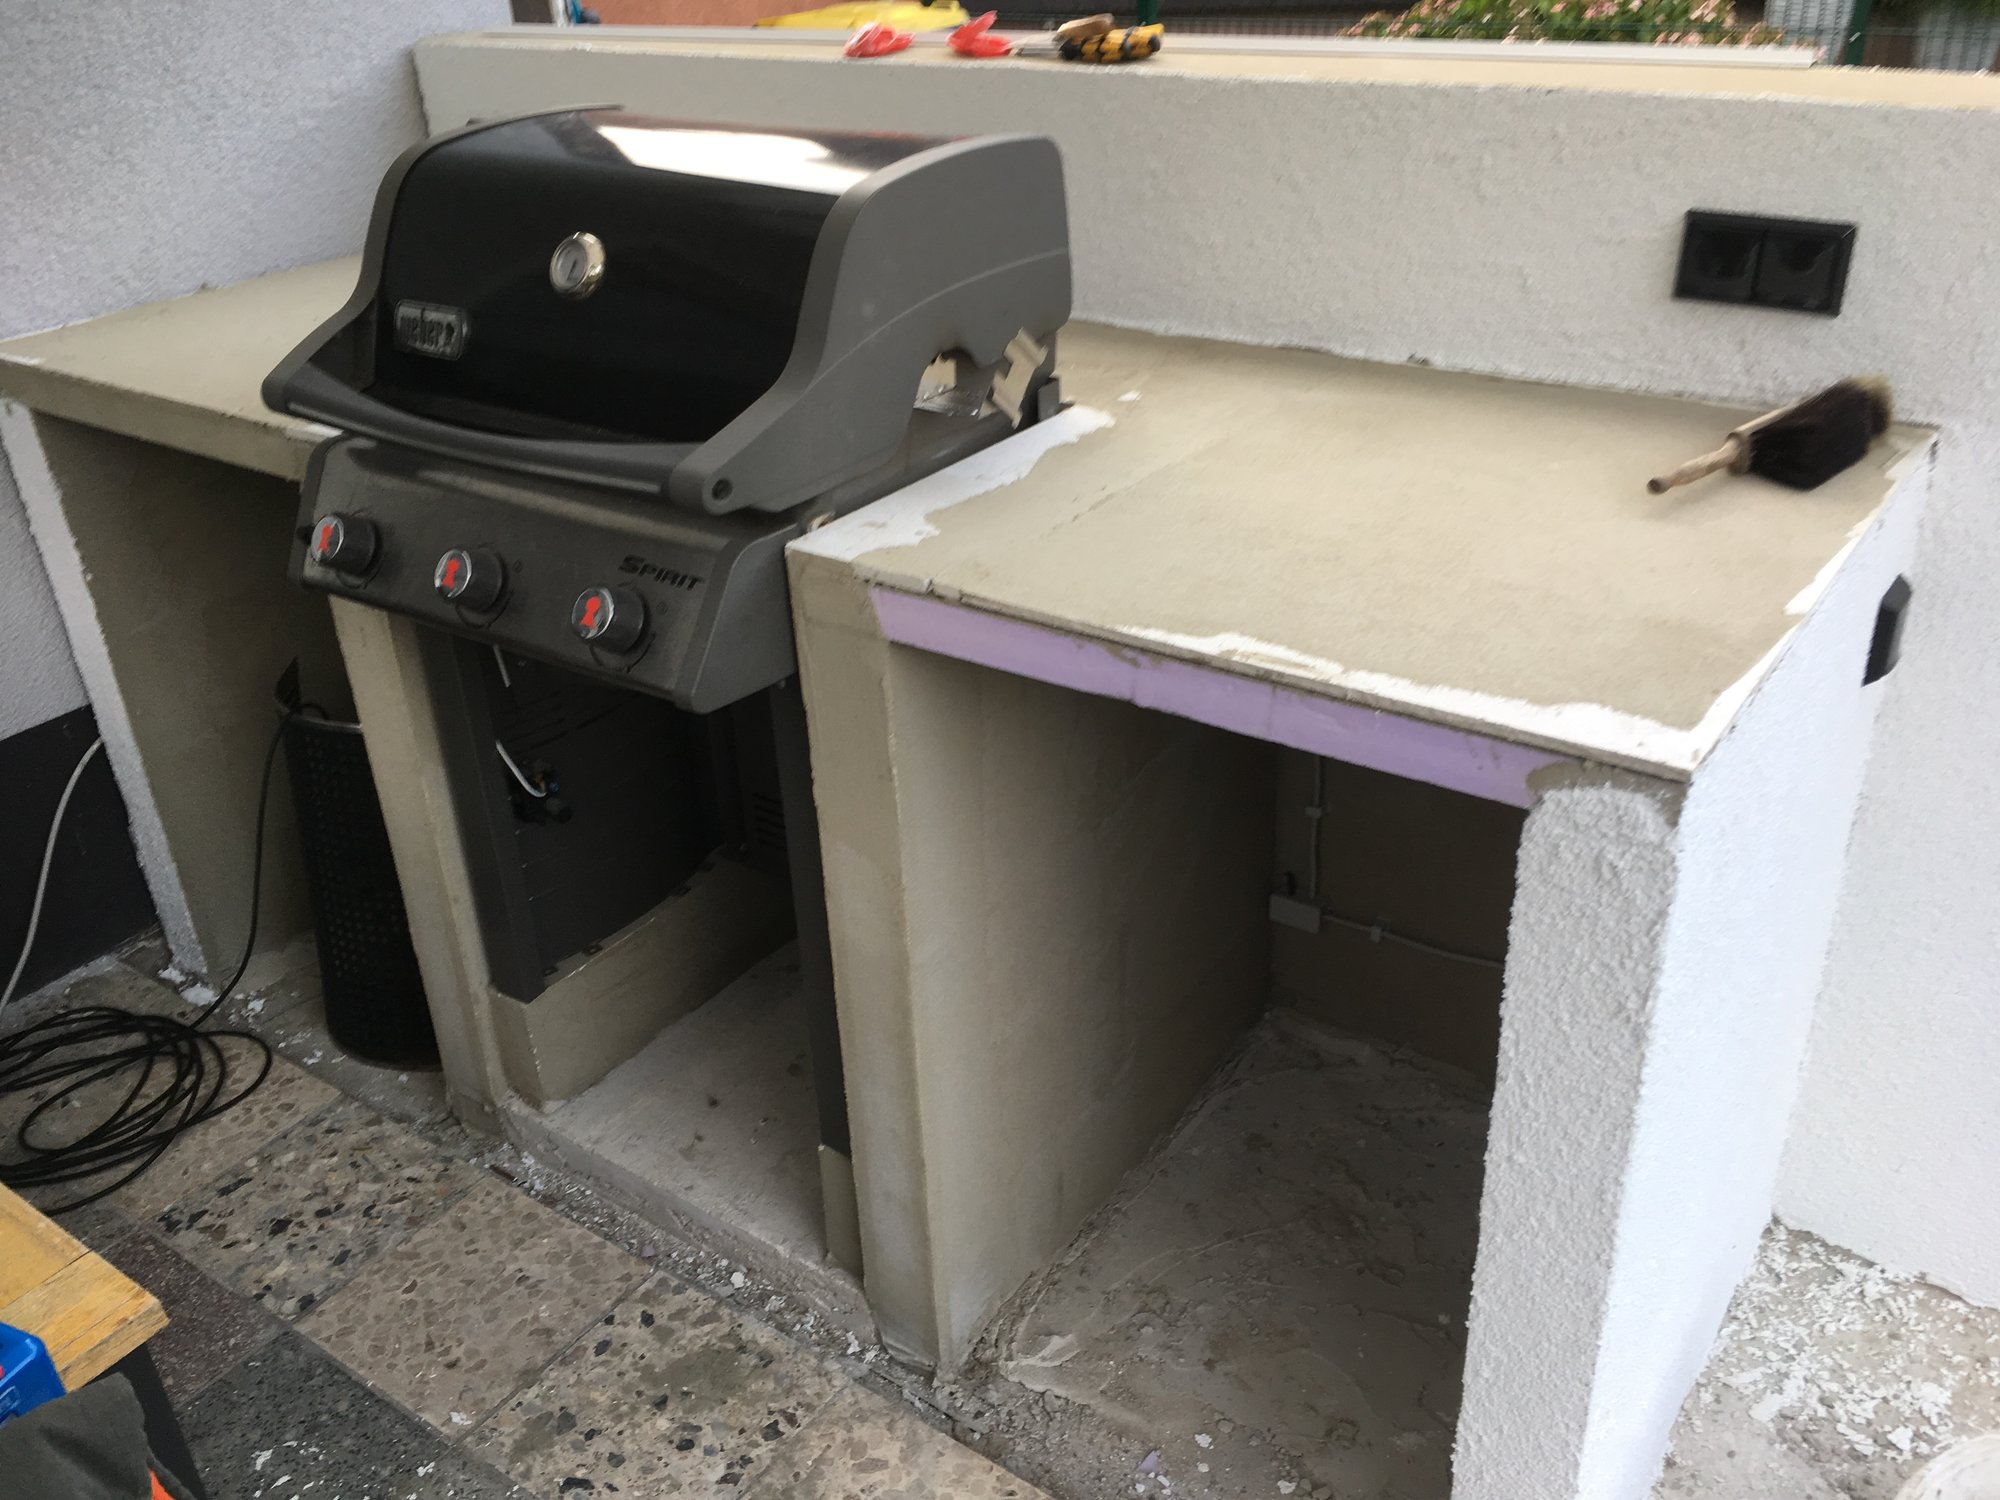 Weber Grill In Outdoor Küche Integrieren : Outdoorküche weber weberia outdoorküche weber weberia